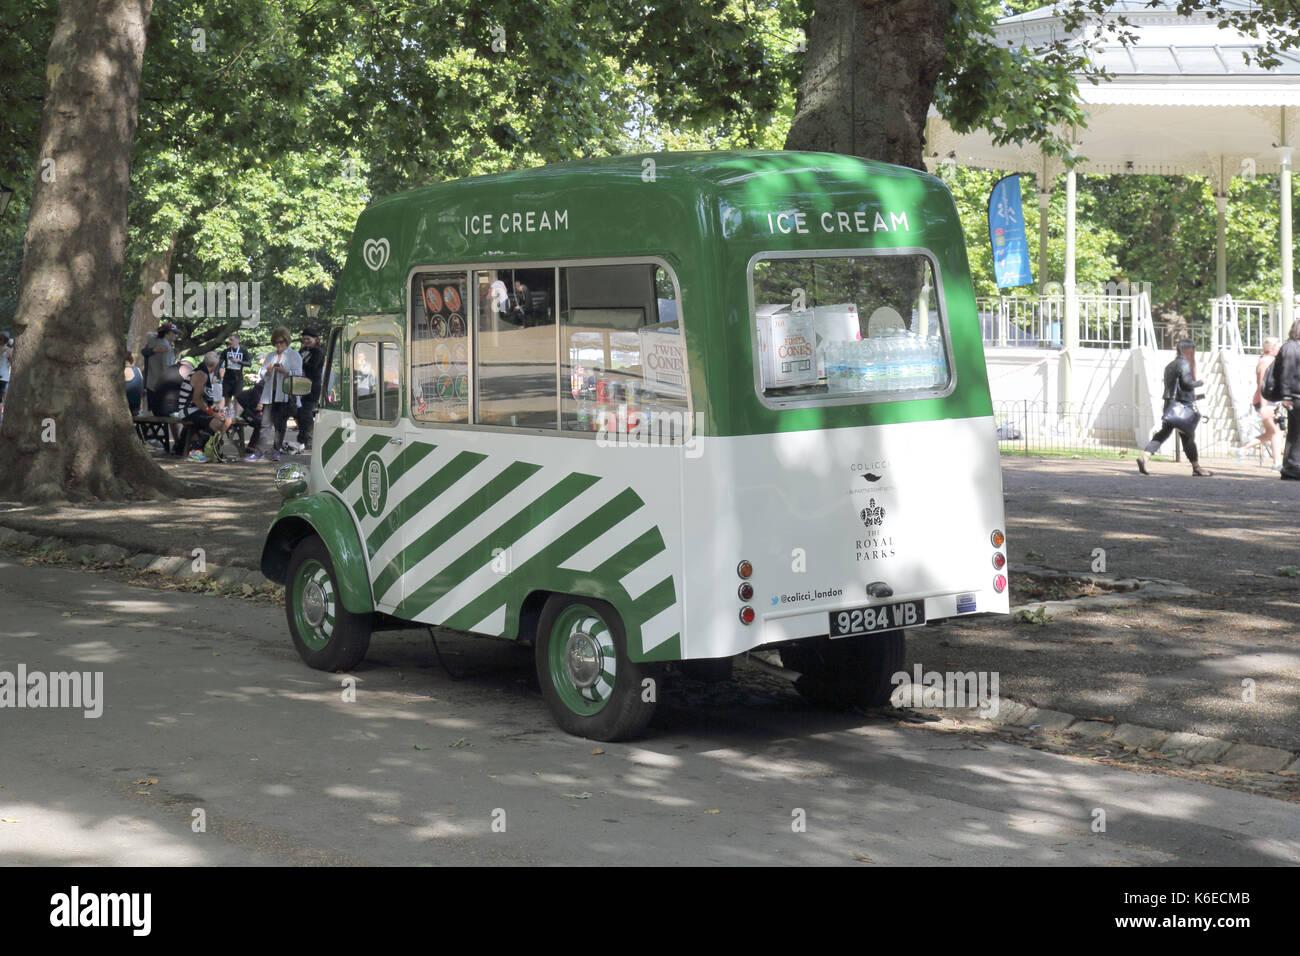 Green Ice Cream Van Stock Photos & Green Ice Cream Van Stock